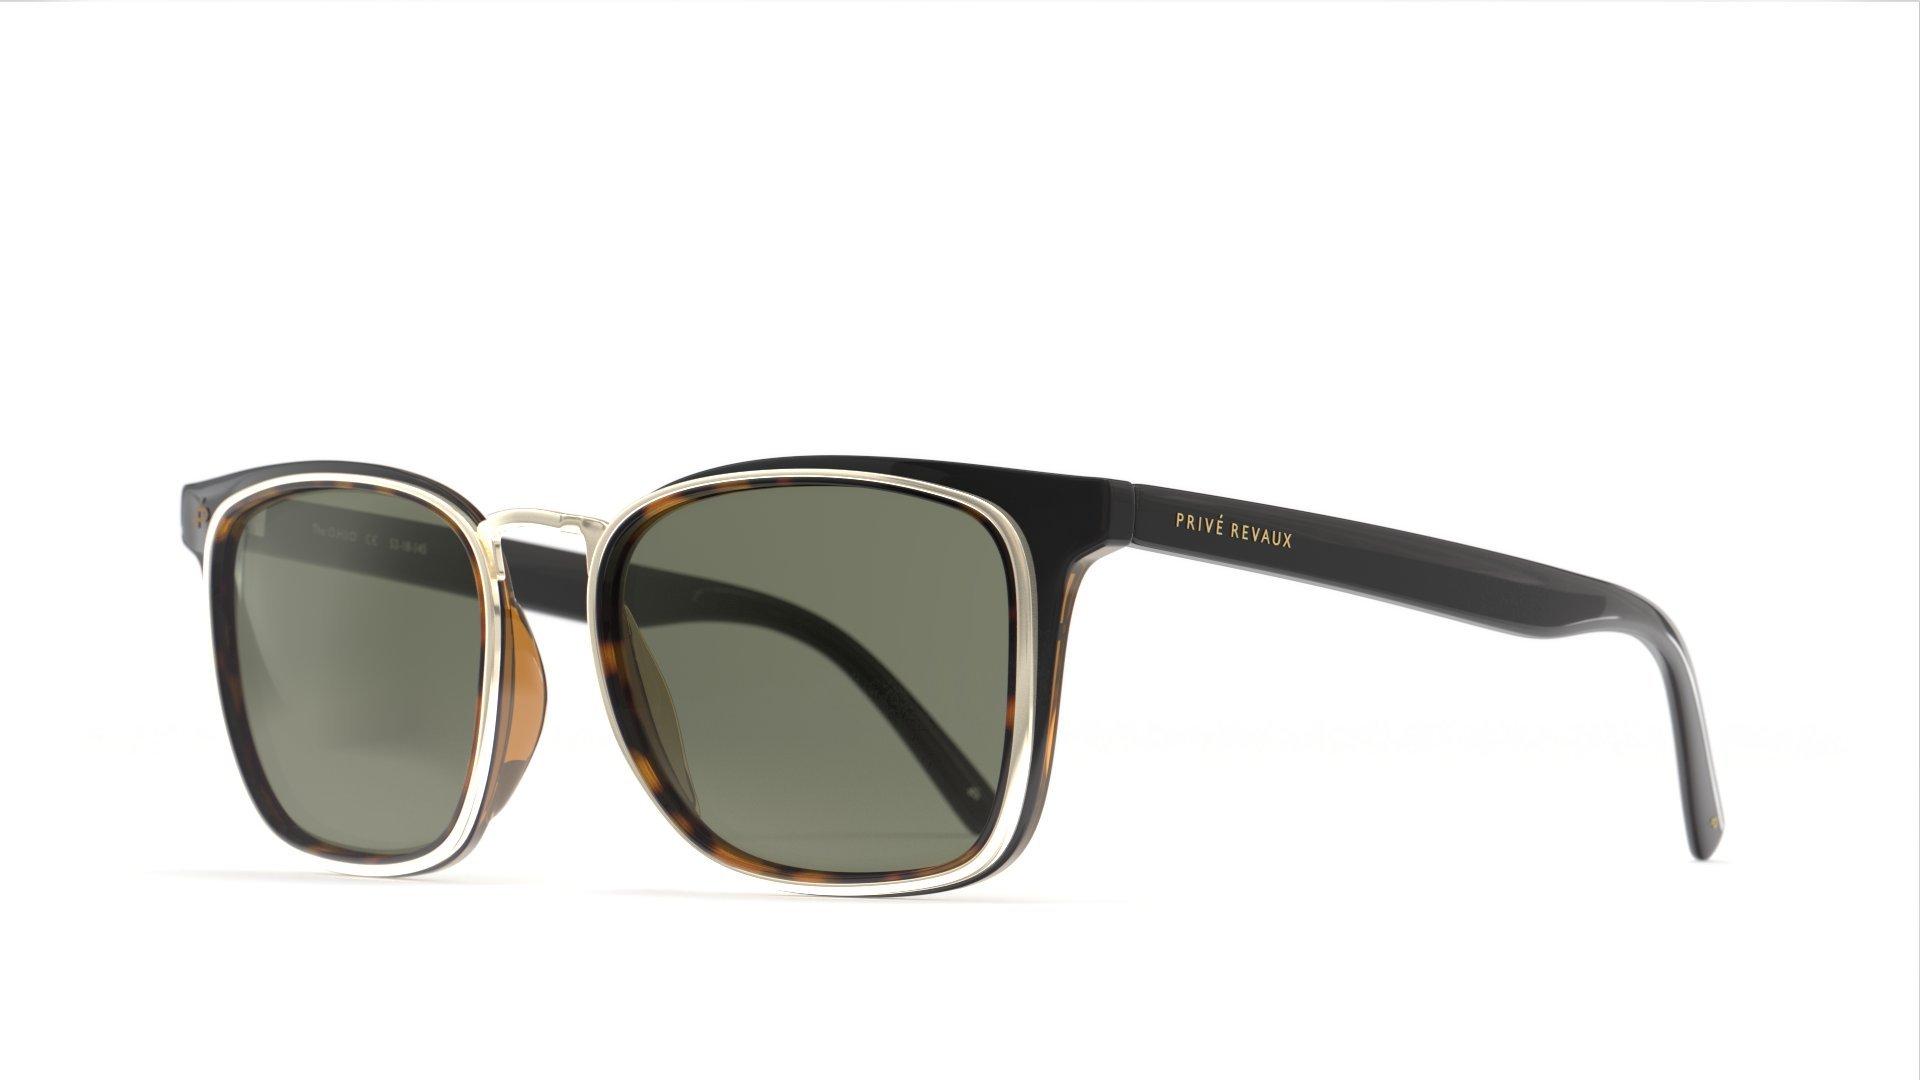 PRIVÉ REVAUX Places We Love Collection''The O.H.I.O'' Polarized Designer Square Sunglasses by PRIVÉ REVAUX (Image #2)